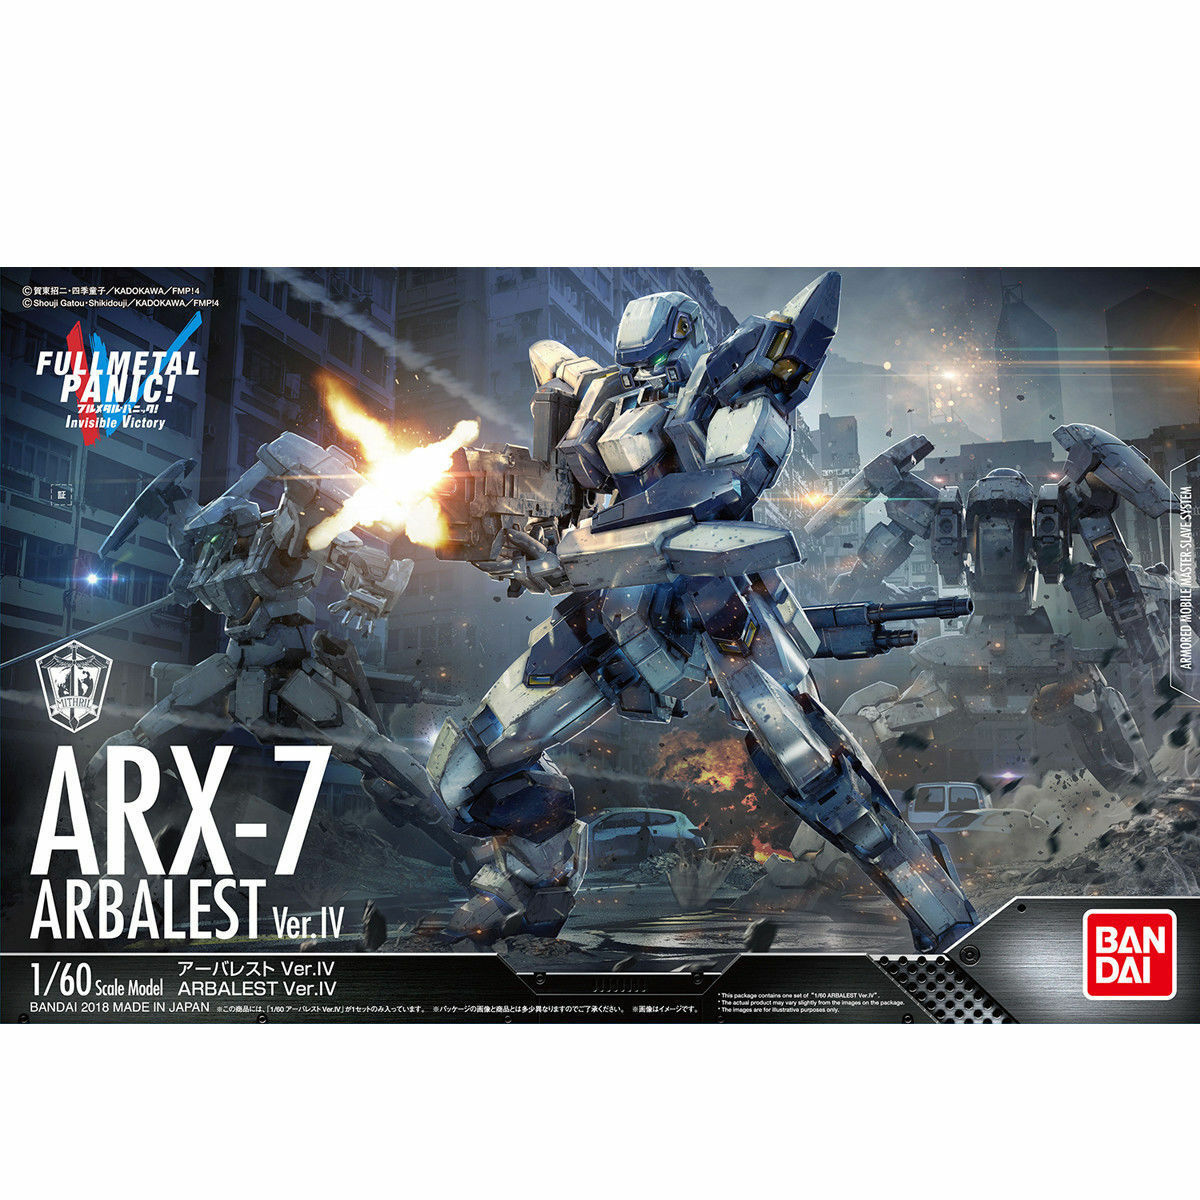 BANDAI 1 60 ARX-7 ARX-7 ARX-7 ARBALEST Ver.IV Plastic Model Kit Full Metal NEW Panic  088098